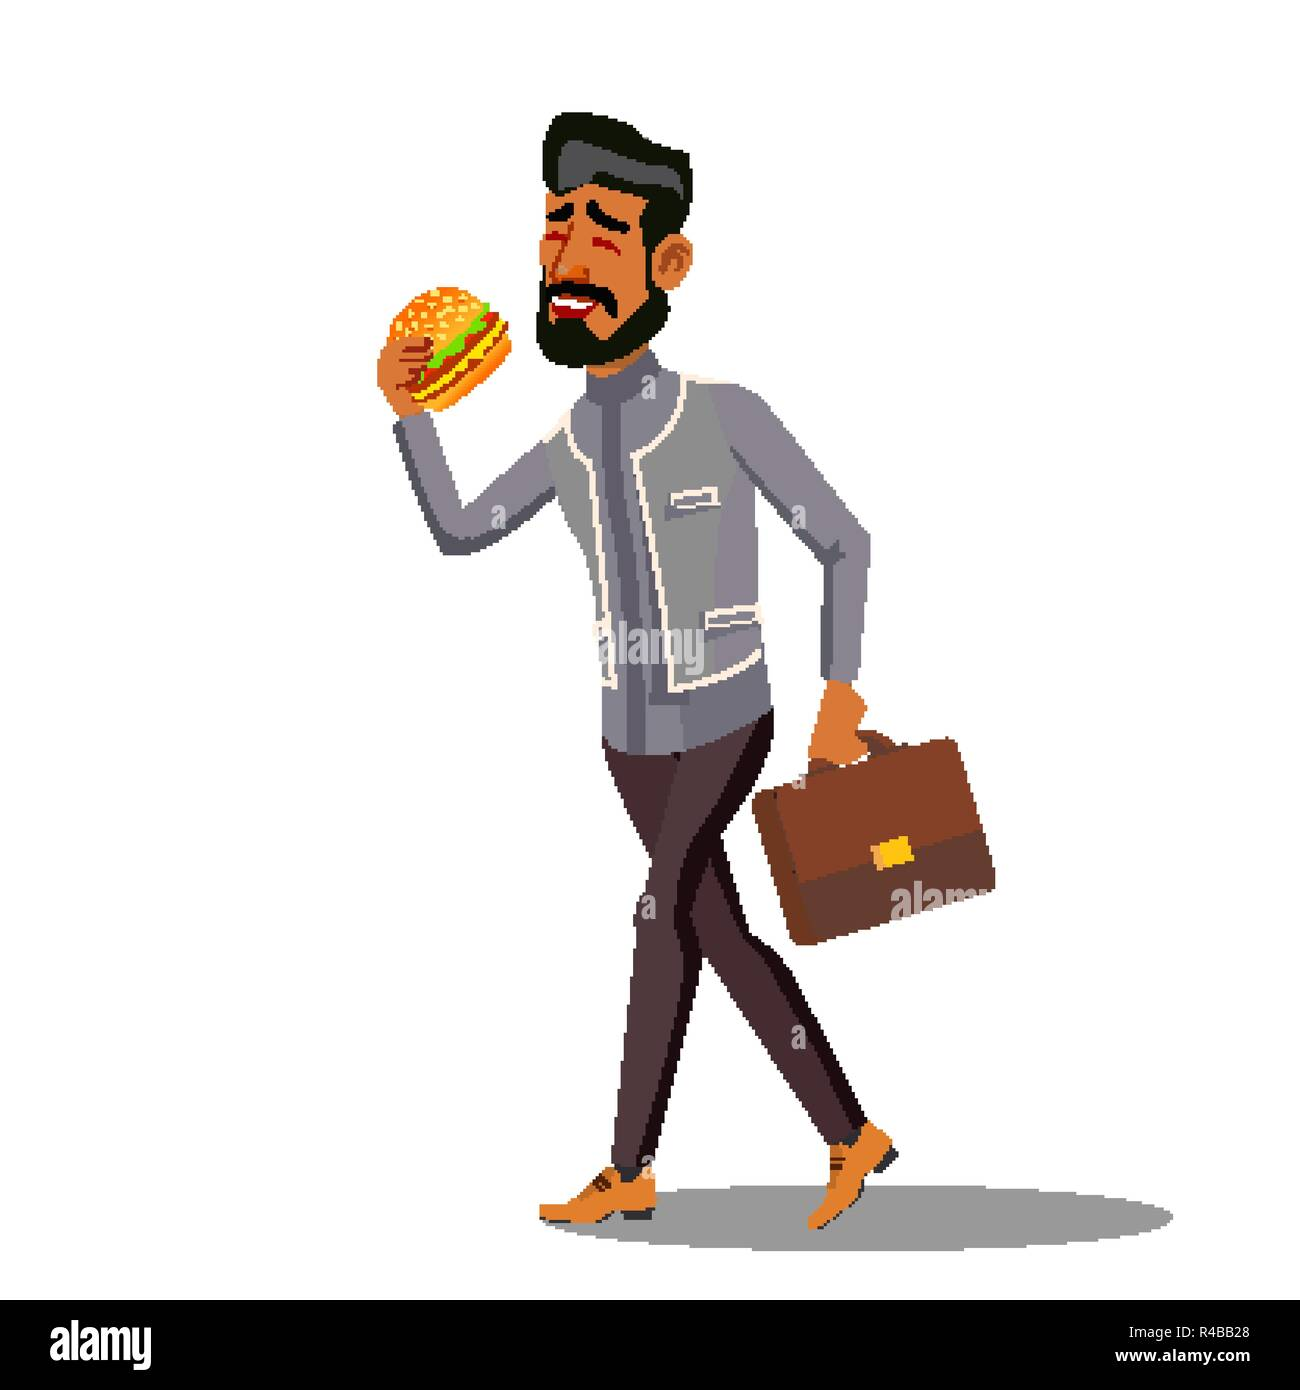 Fast Food, Going Businessman Eating Hamburger Vector. Isolated Cartoon Illustration Stock Vector